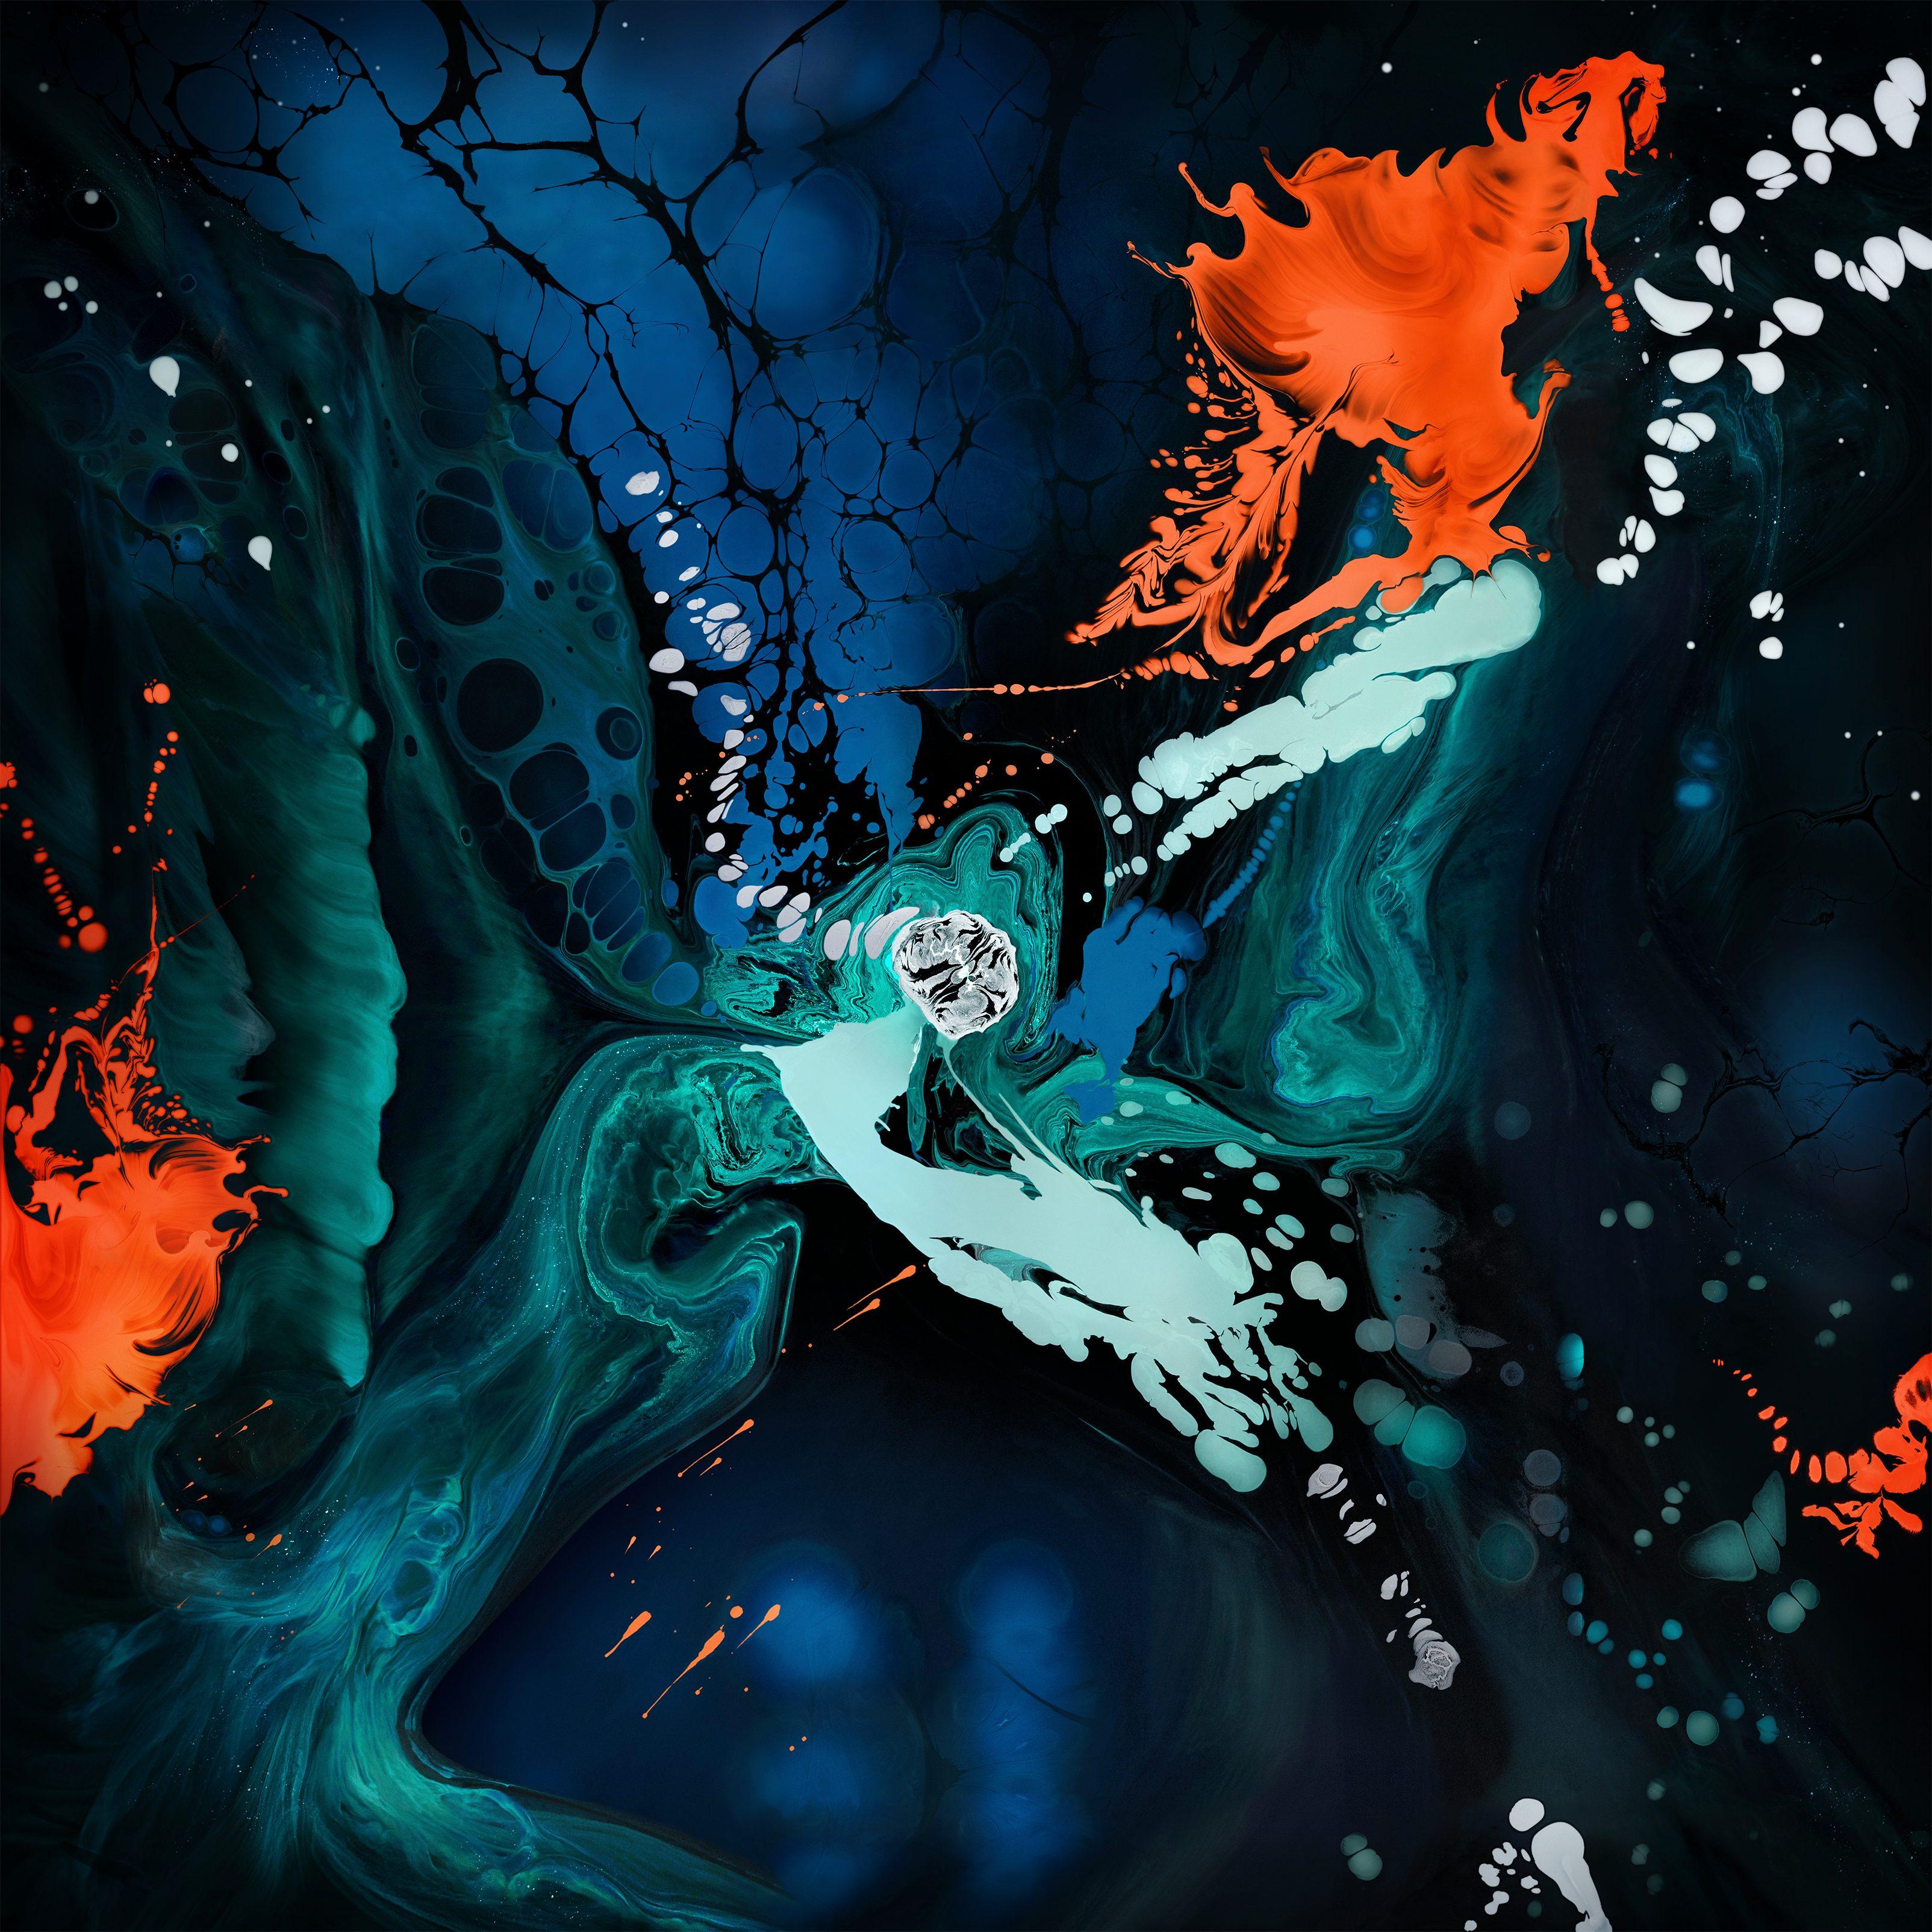 Ipad Pro 4k Wallpaper Liquid Art Colorful Apple Stock Abstract 1386